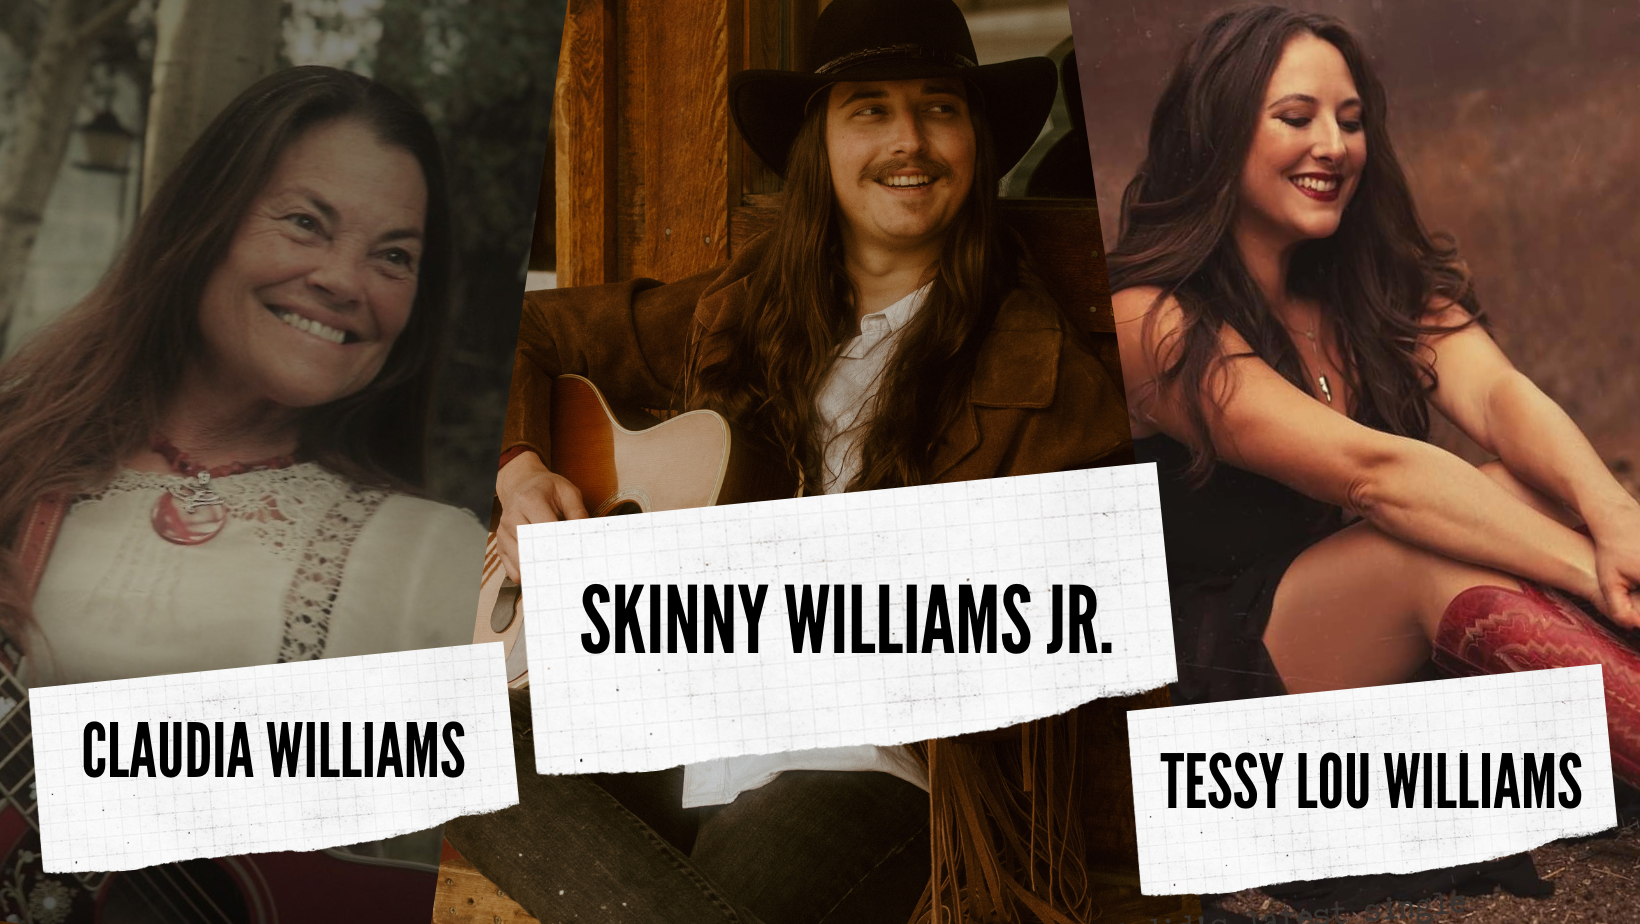 Skinny Williams Jr. featuring Claudia Williams and Tessy Lou Williams